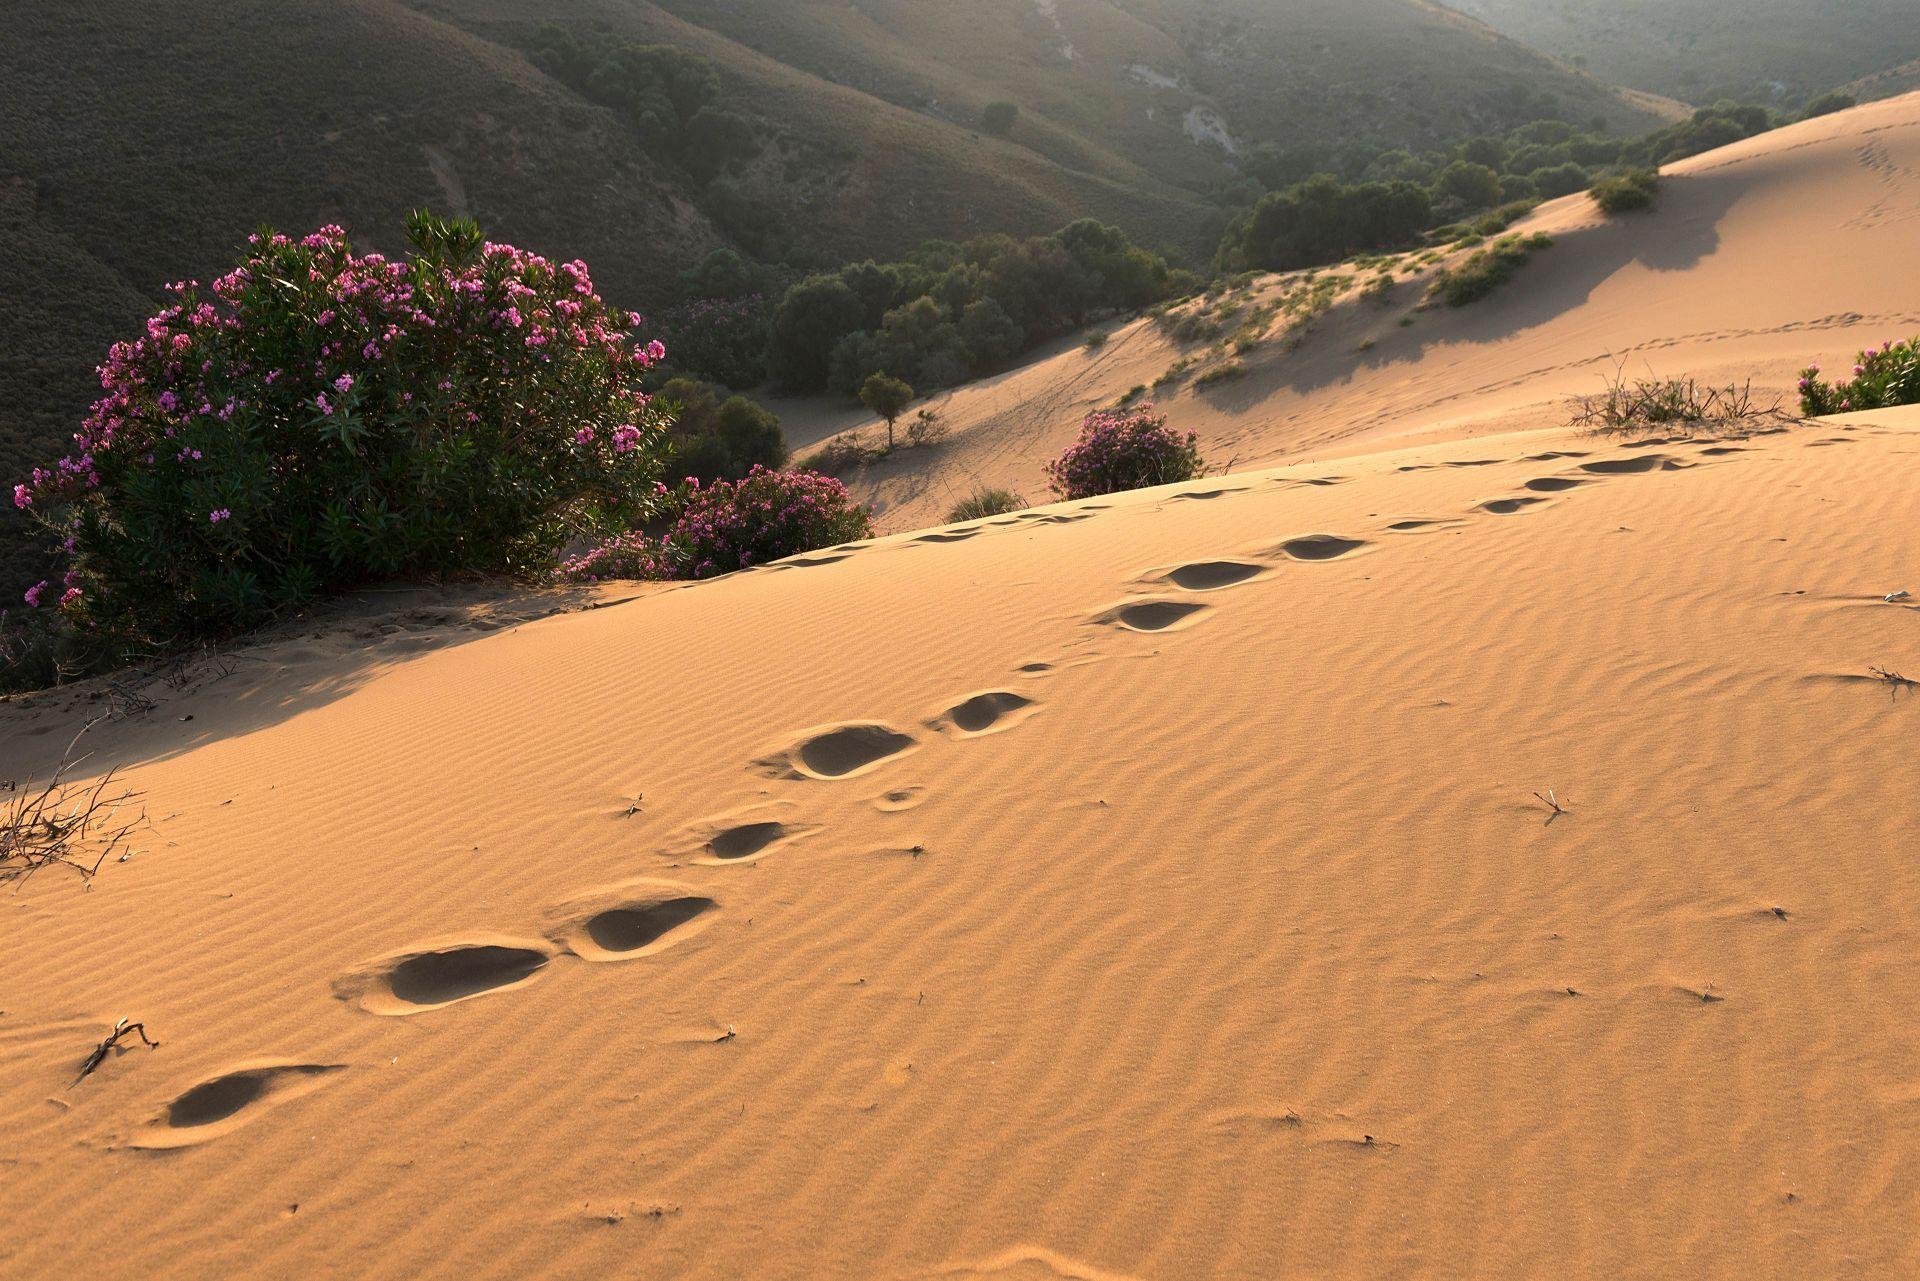 Lemnos island: Sand dunes